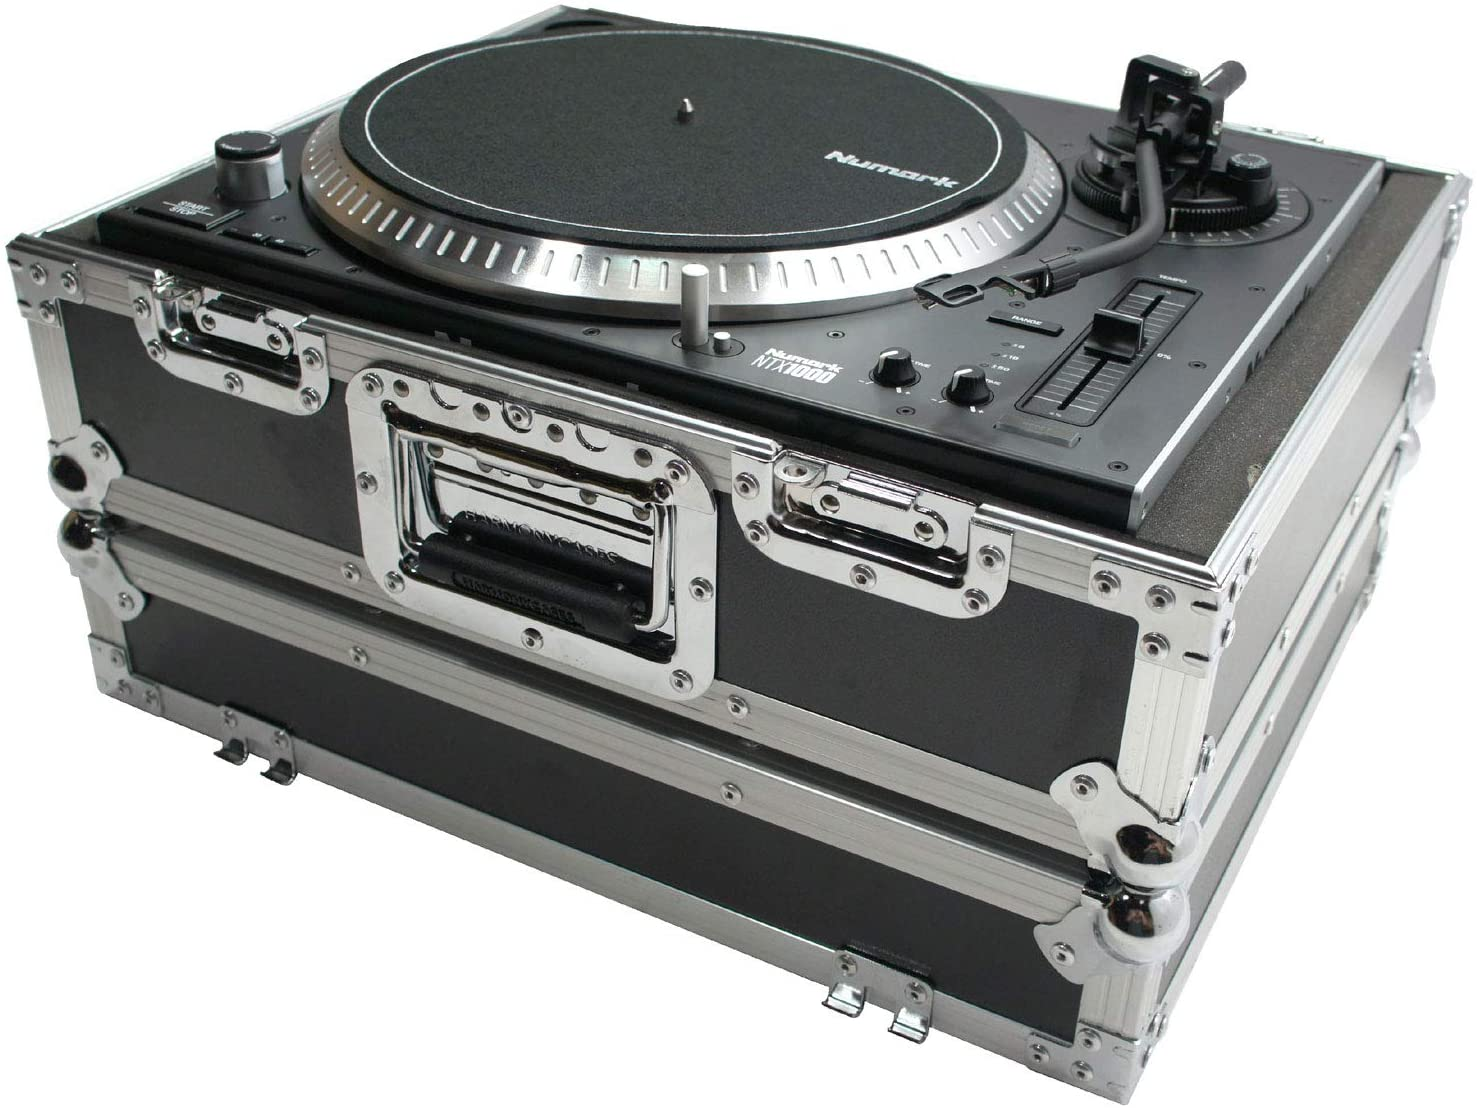 Harmony HC1200E Flight Foam Turntable Custom Case Compatible with Audio Technica AT-LP120